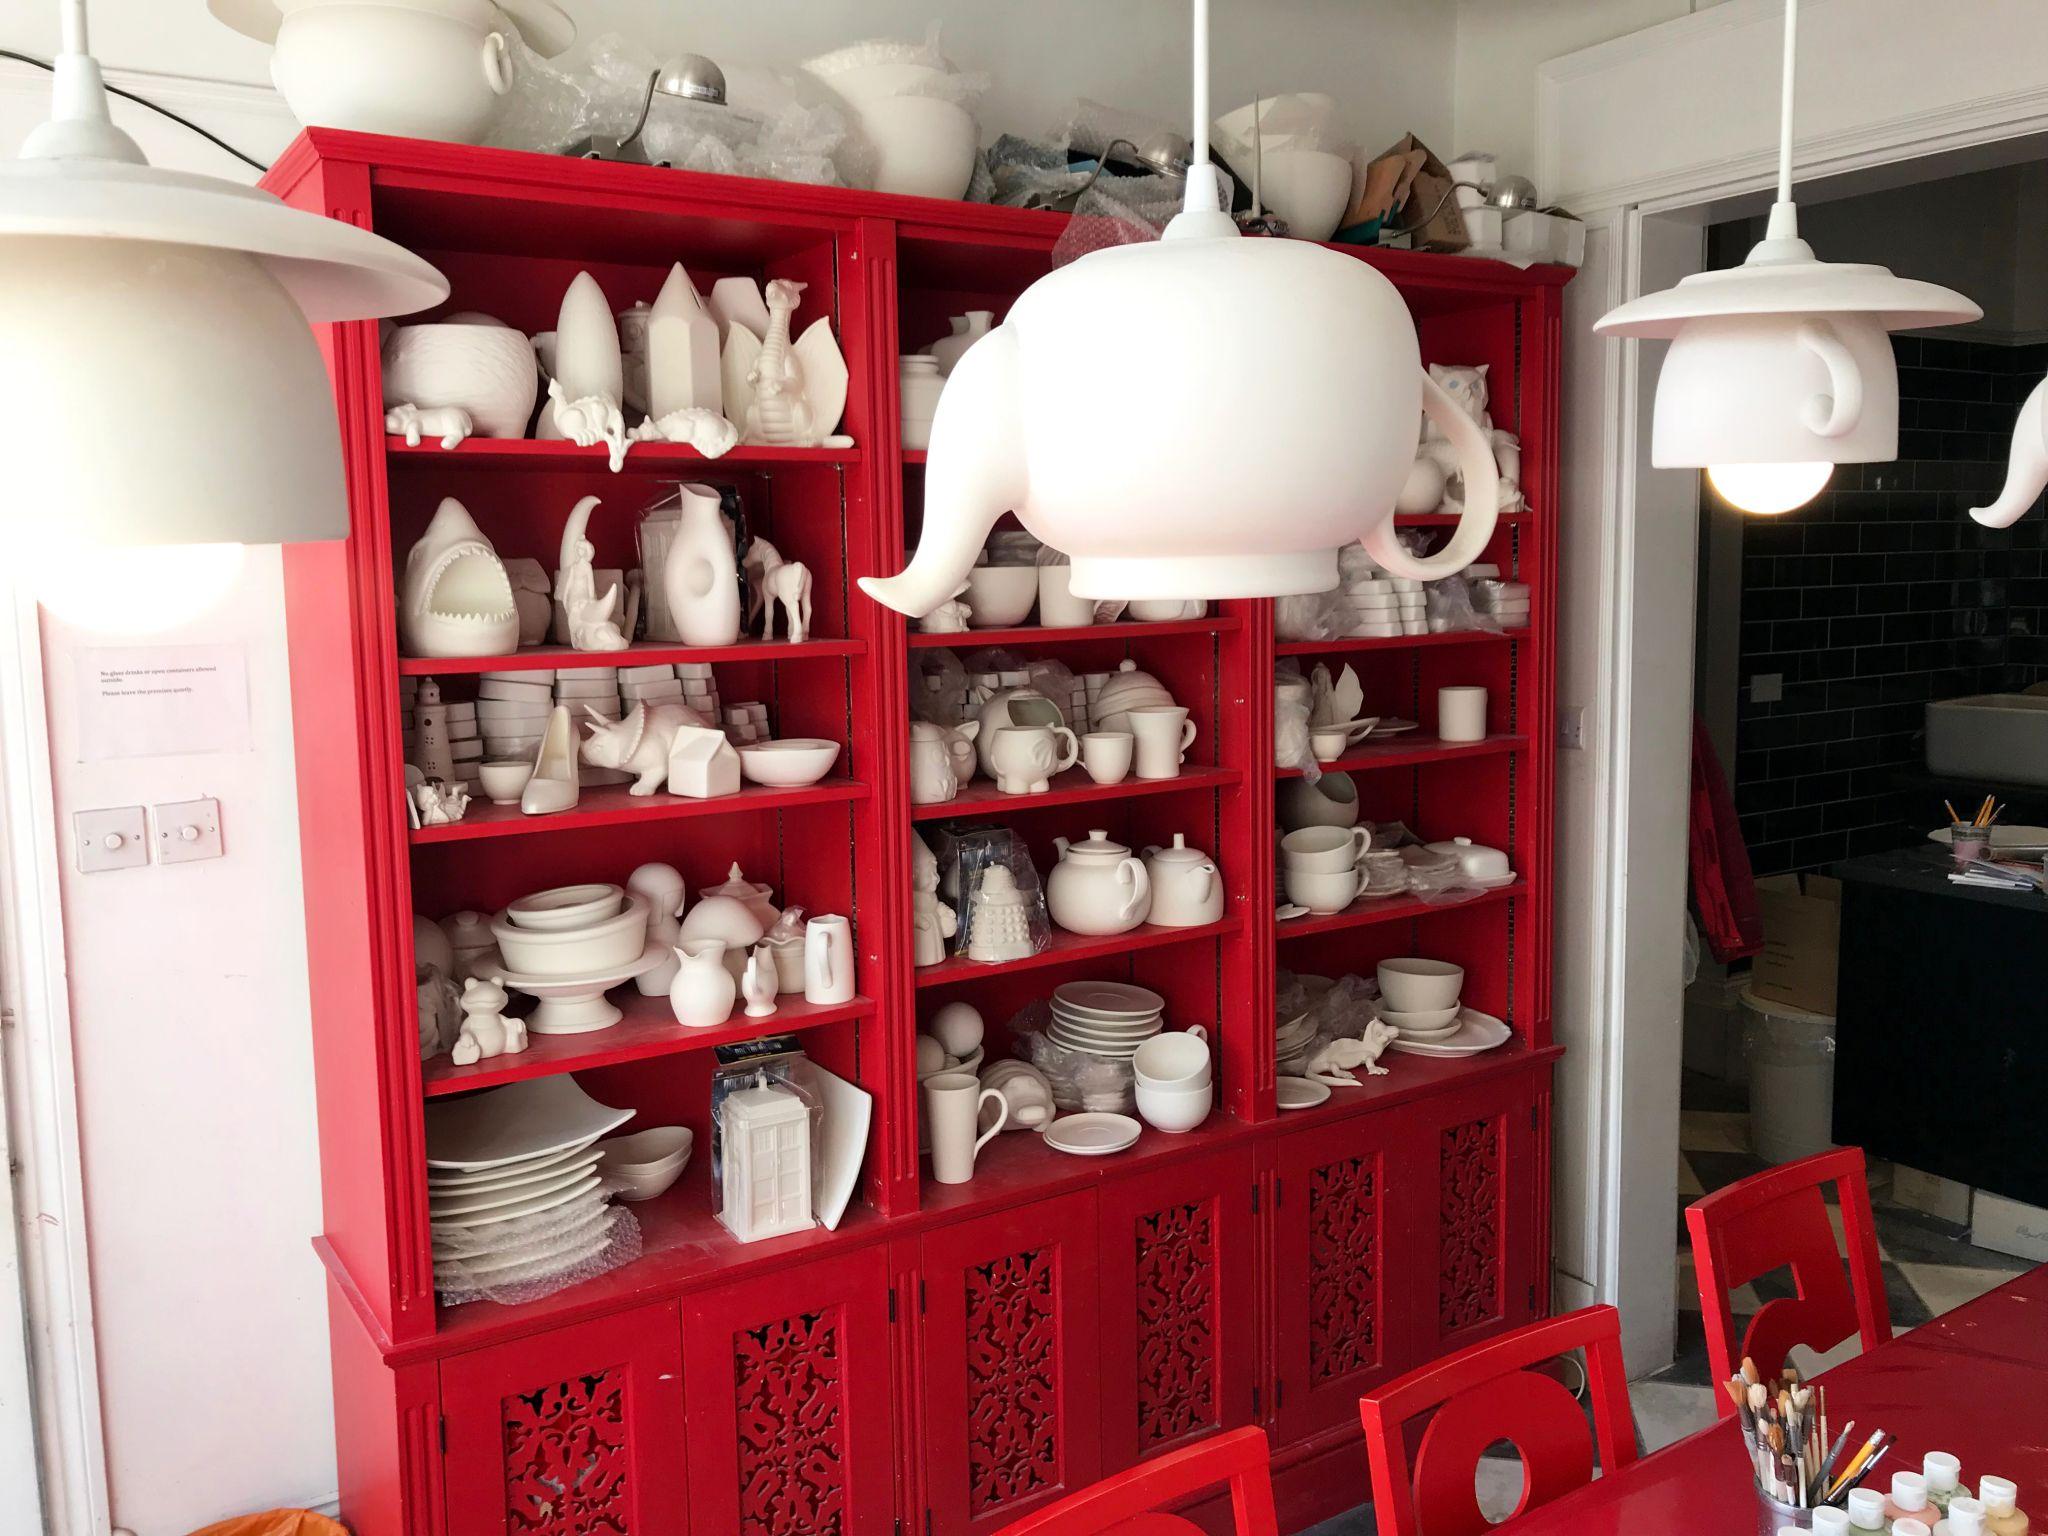 Wonderland Ceramics cafe